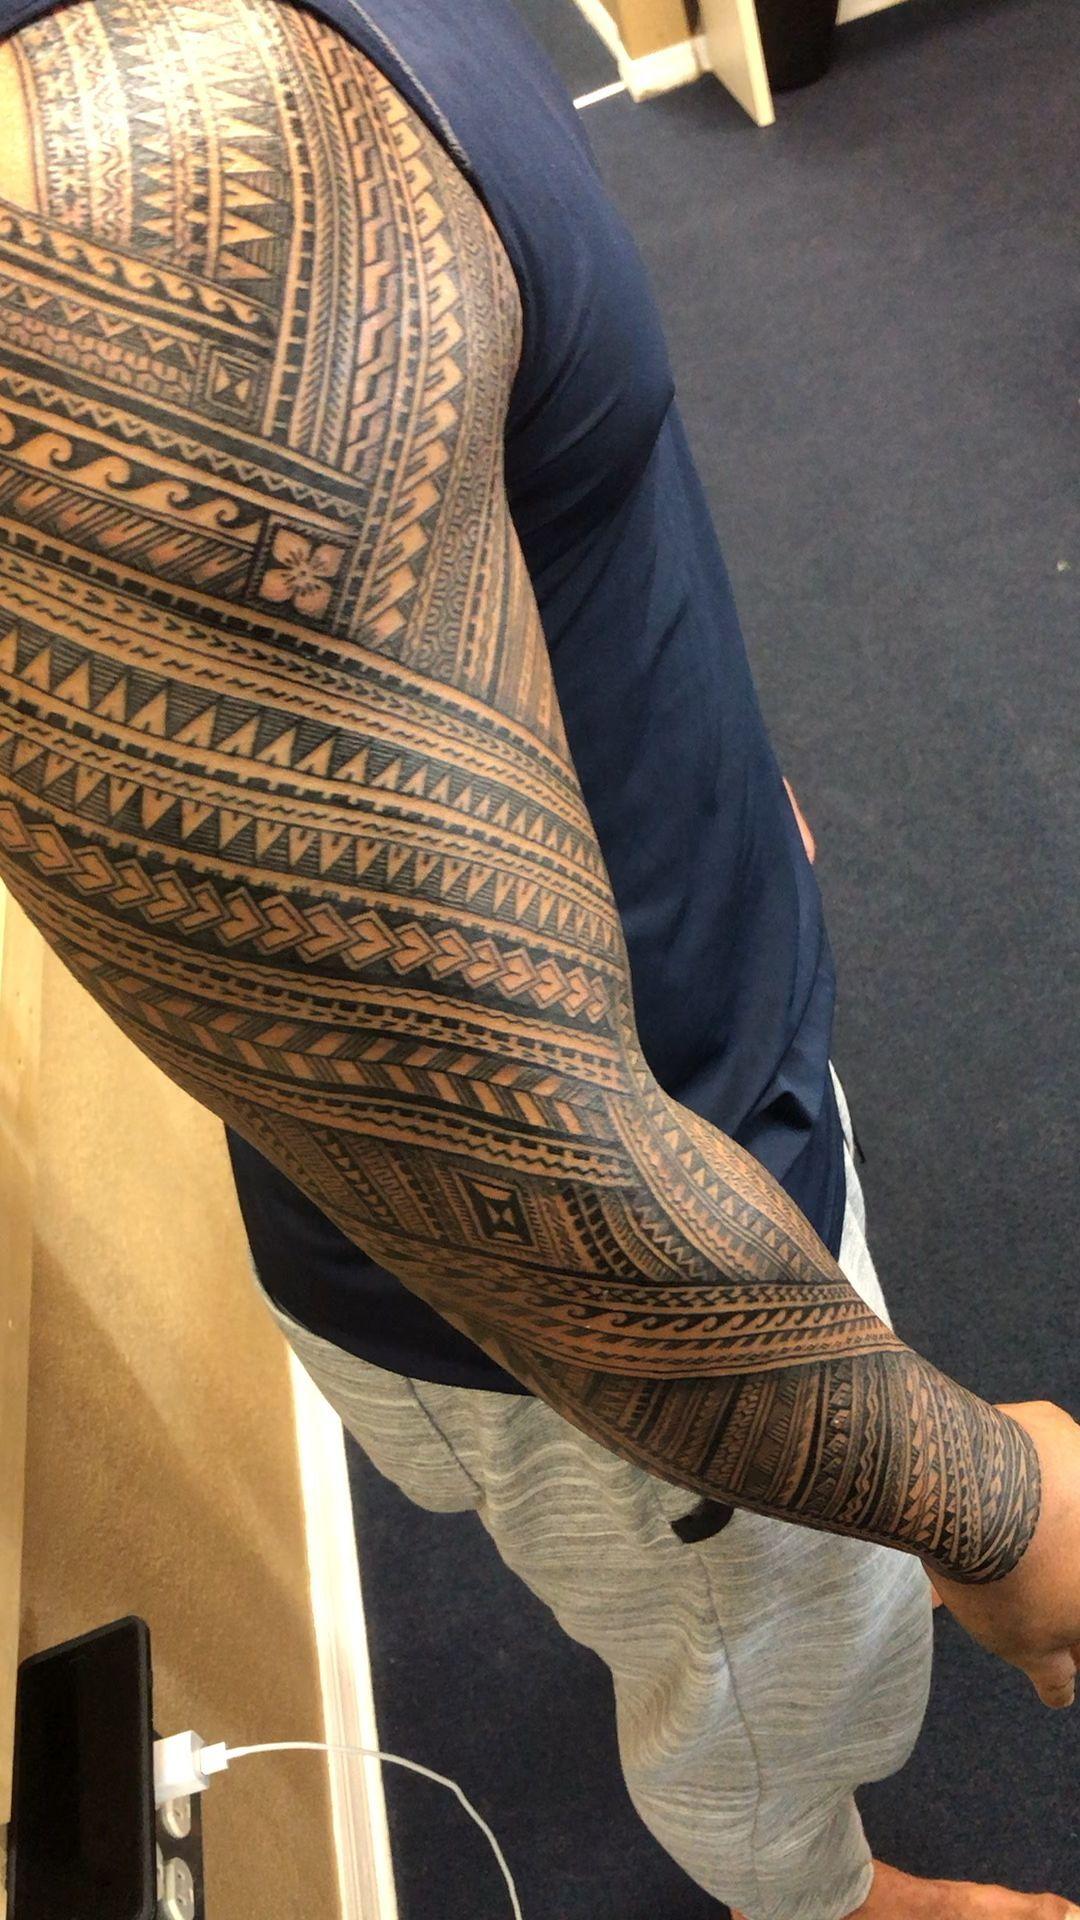 Samoan Tattoo sleeve Michael Fatutoa  #samoantattoo #samoan tattoo #samoan tatto…